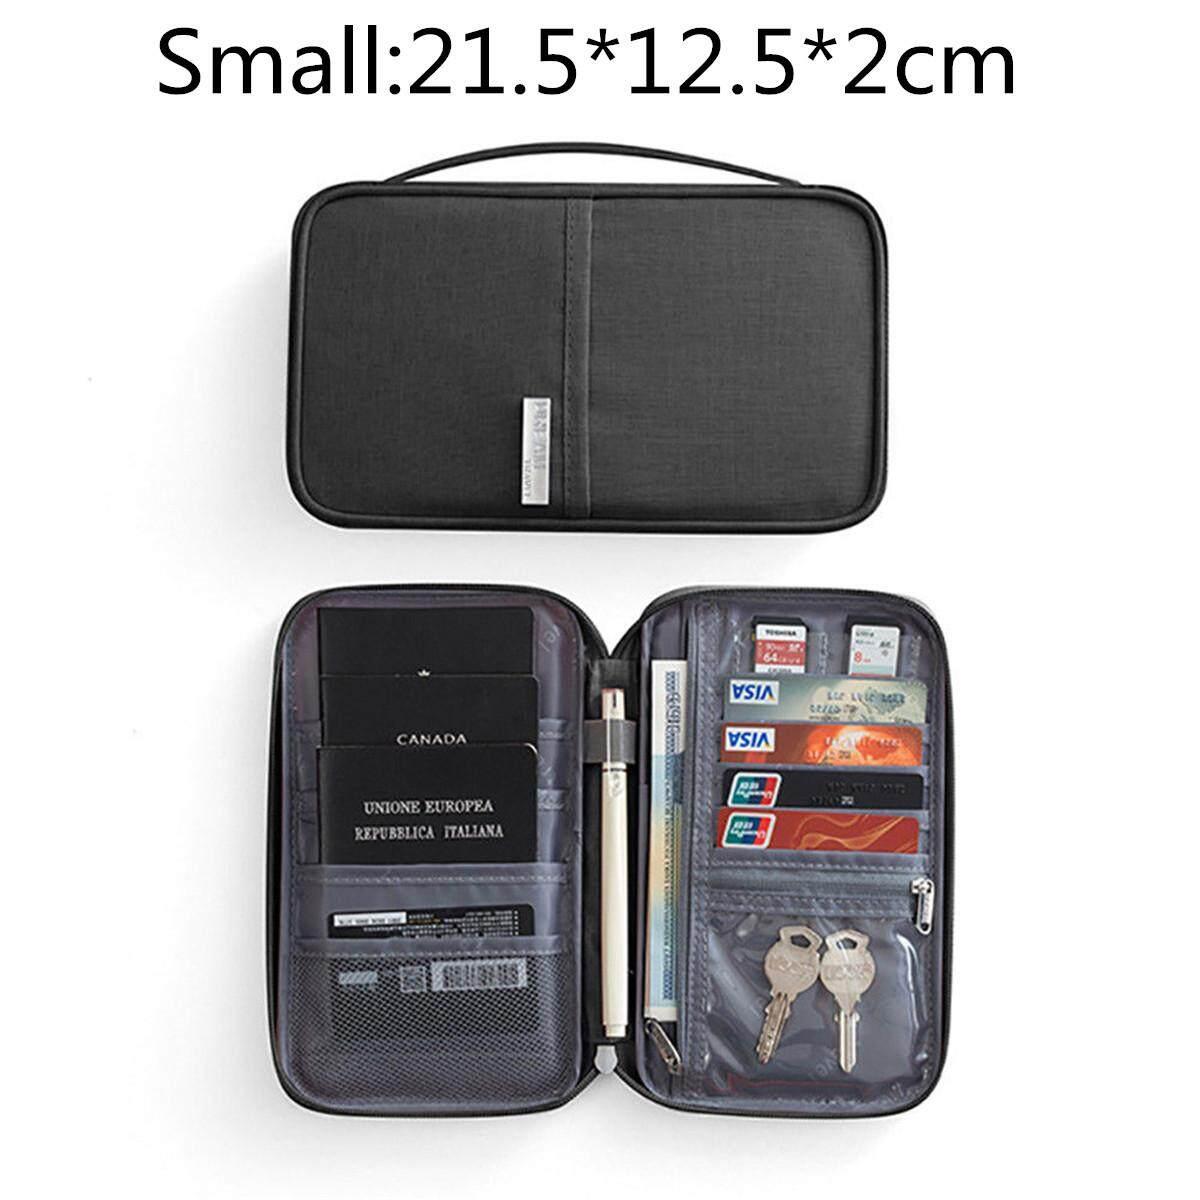 5a6888a5b129 RFID Blocking Travel Card Storage Bag Passport Document Wallet Organizer  Holder #Small